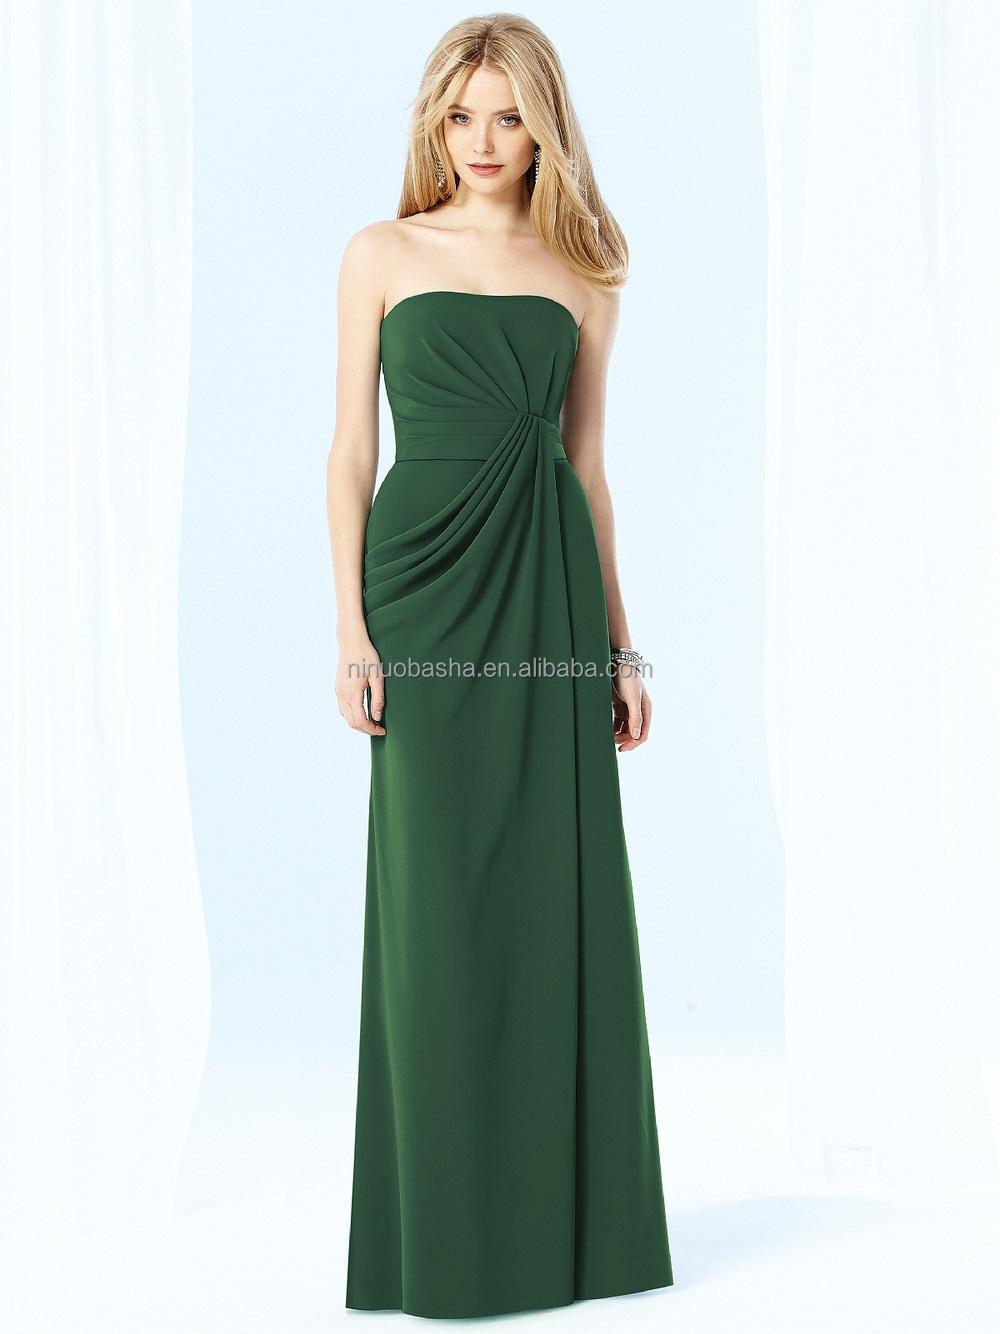 bridesmaid dress patterns � fashion dresses